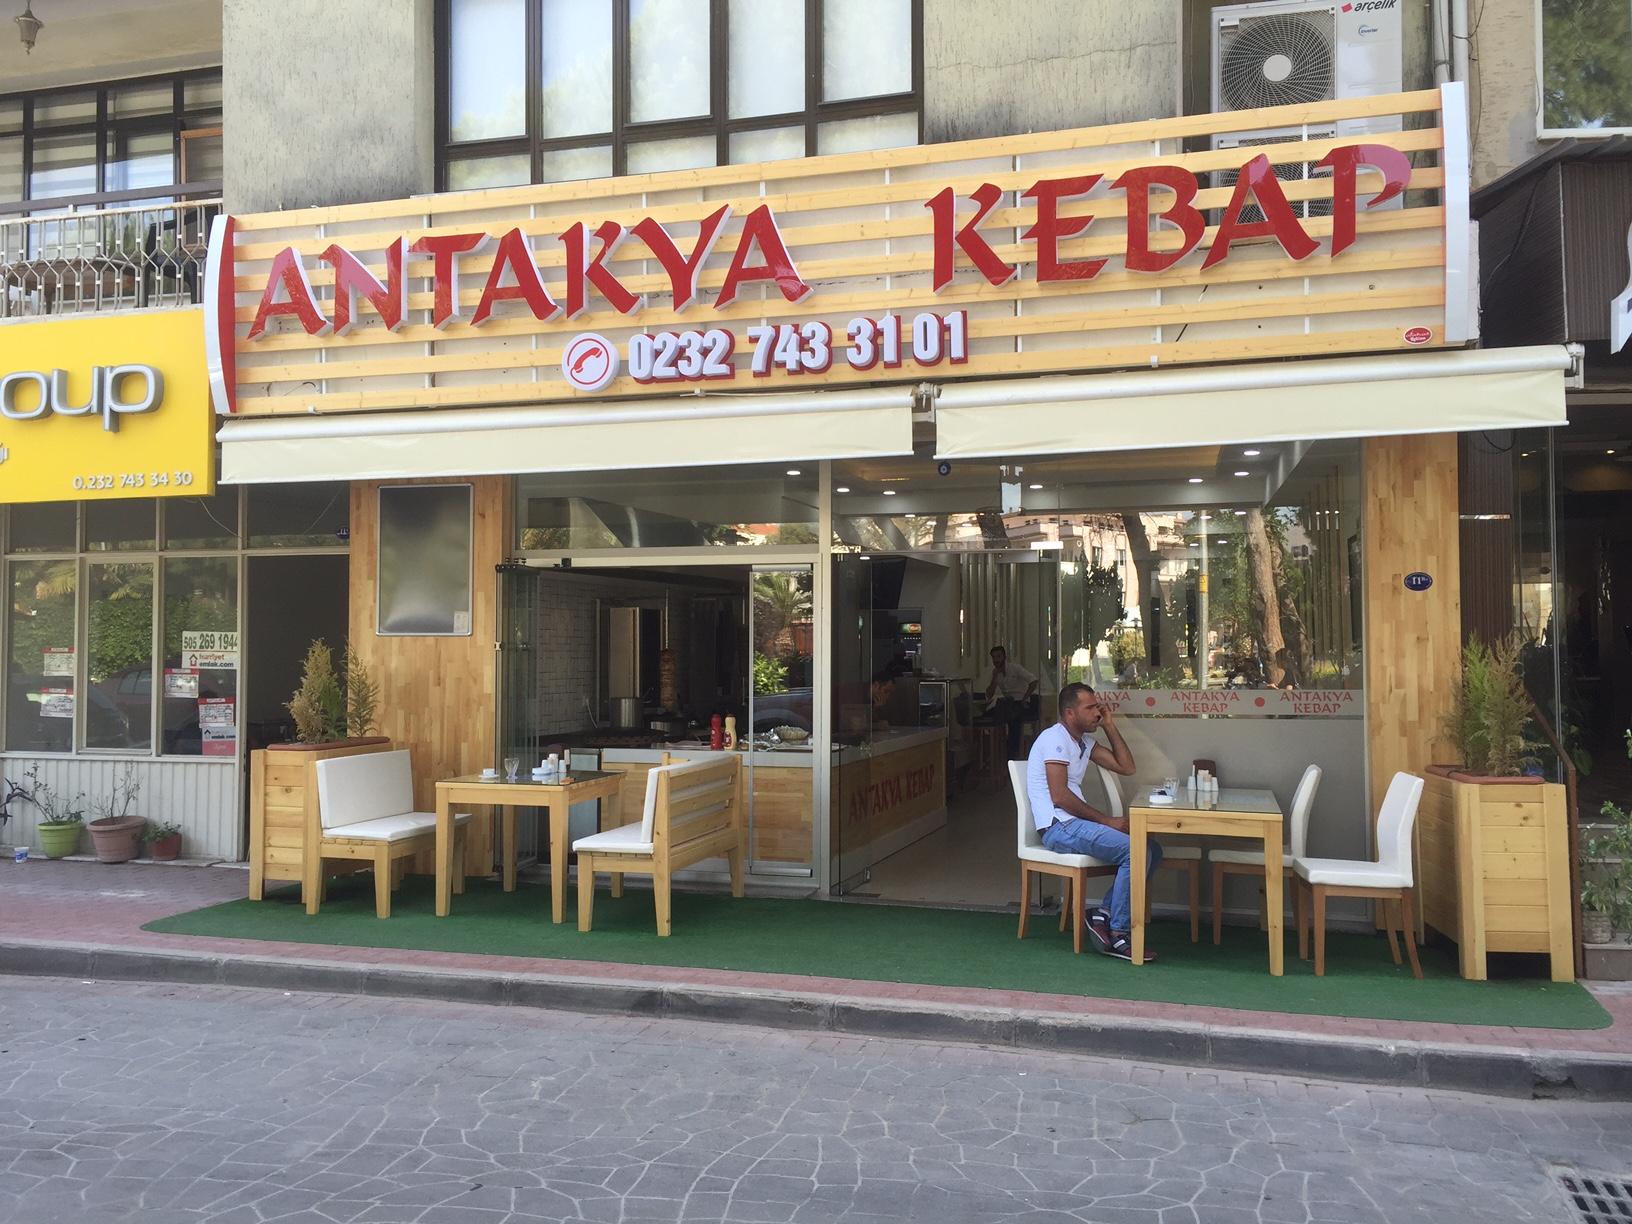 Seferihisar'da Lezzetin yeni Adresi Antakya Kebap